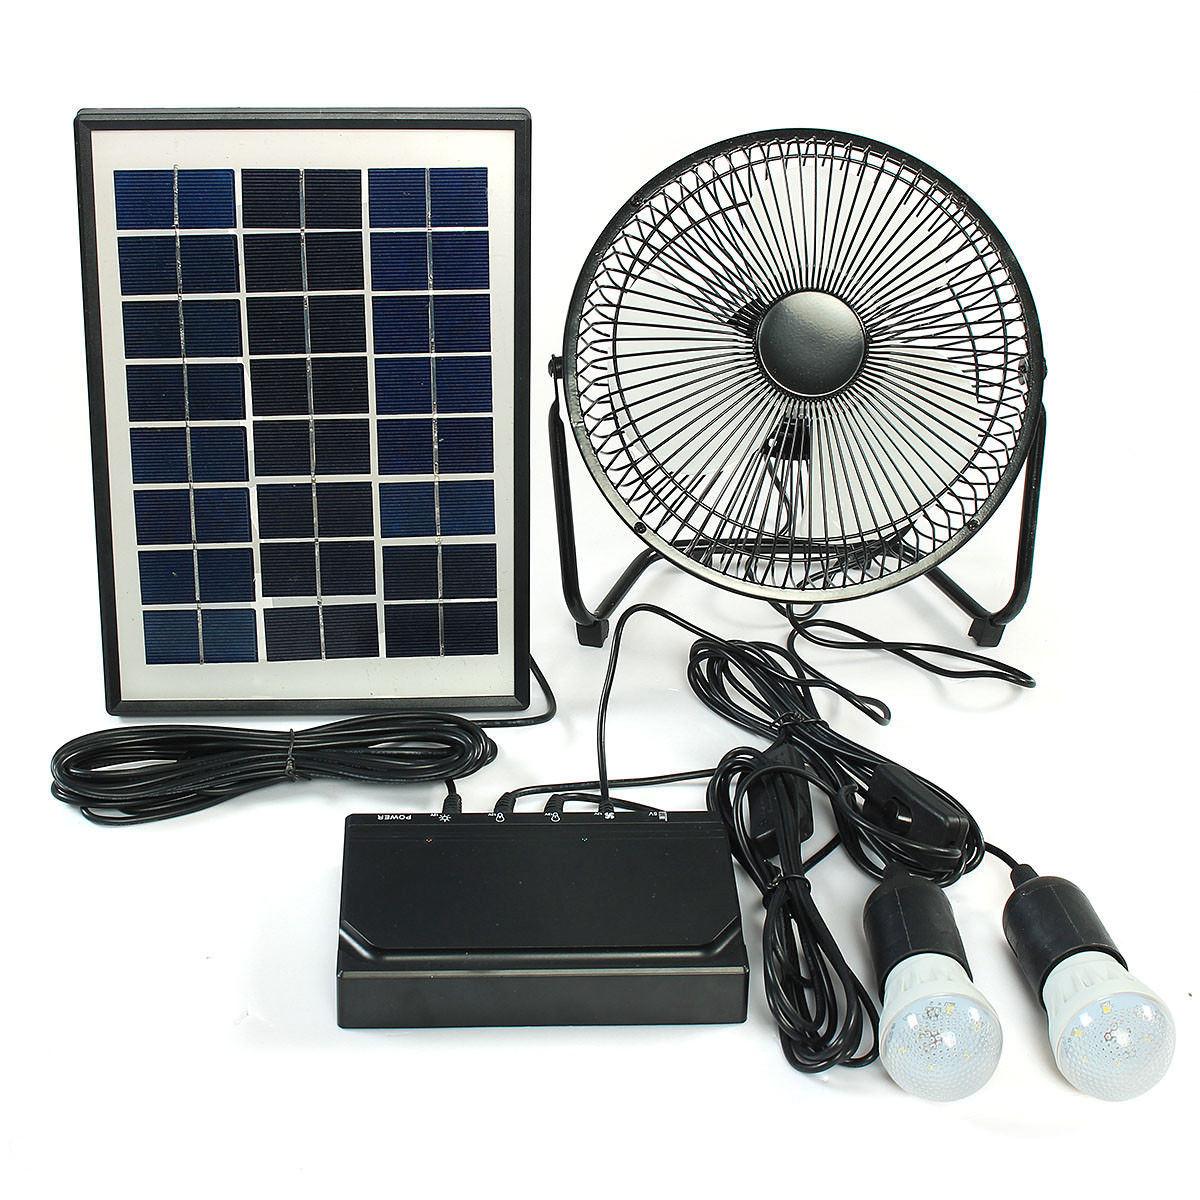 Solar Power Fan >> Hot Item Solar Power Led Light With Fan Kit Dc Solar Fan With Mobile Charger